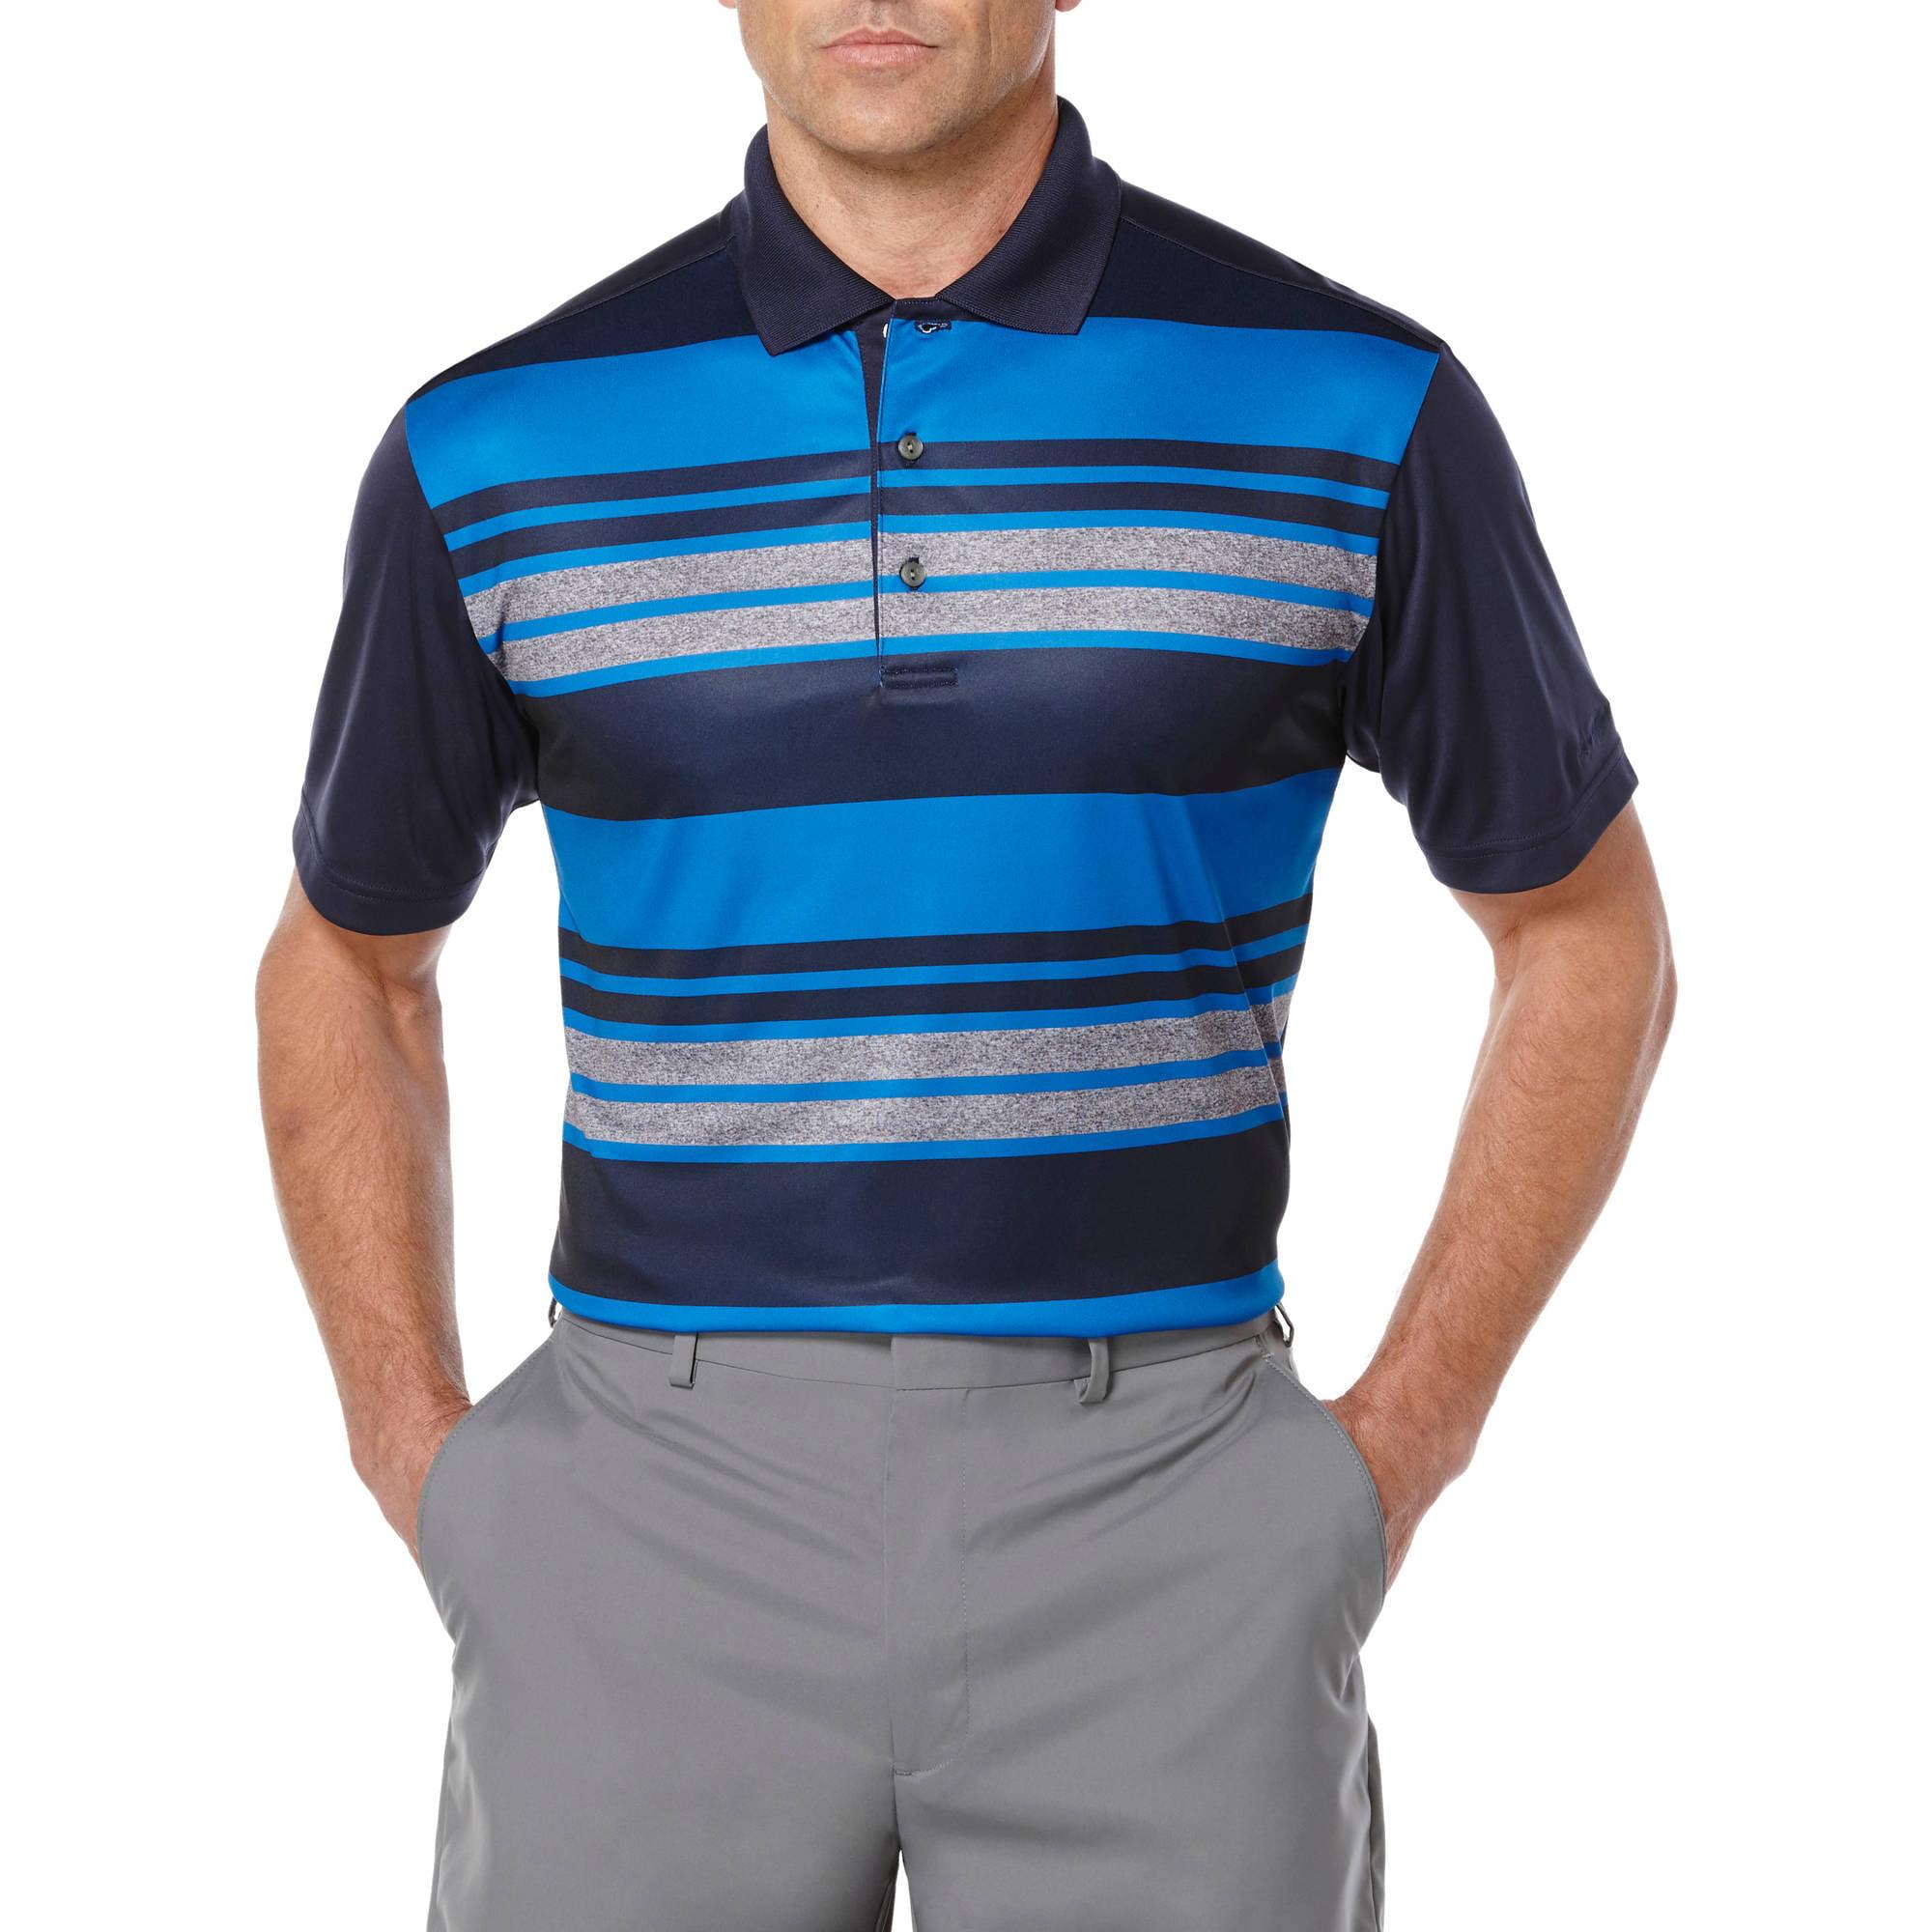 Ben Hogan Performance Big Men's Heather Stripe Polo Shirt